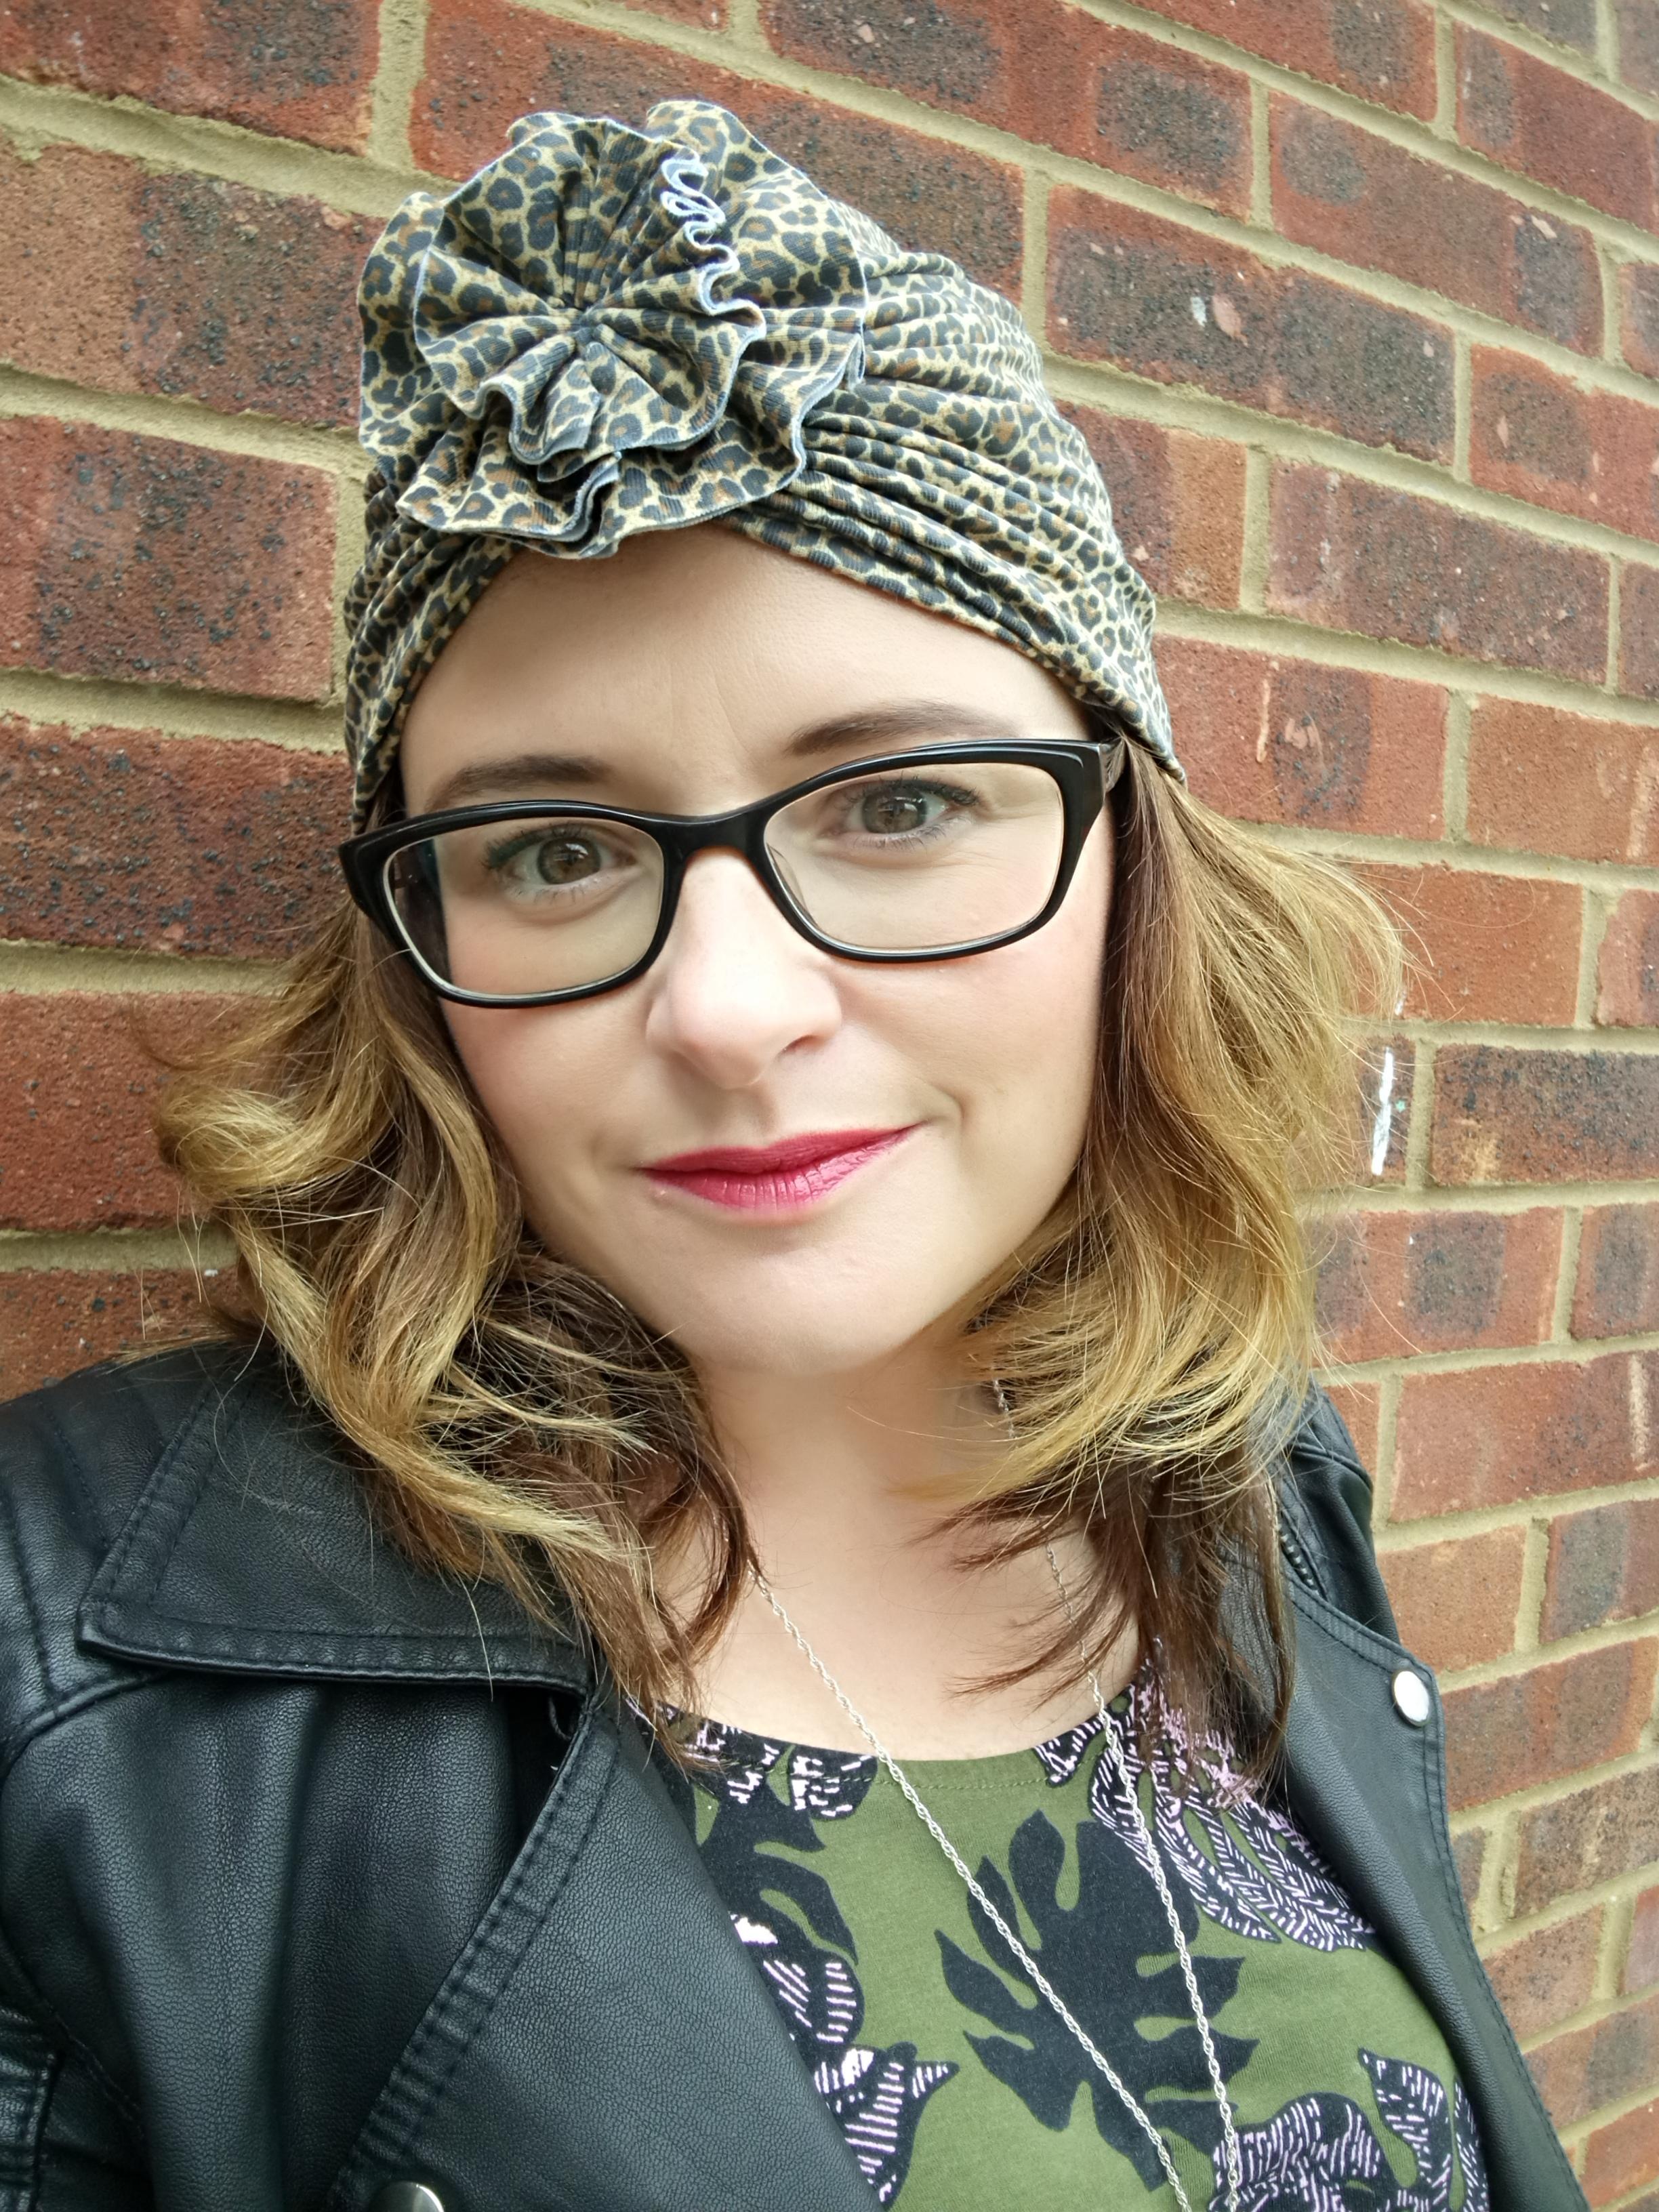 Mrs Beasleys Bows - Corrina Beasley